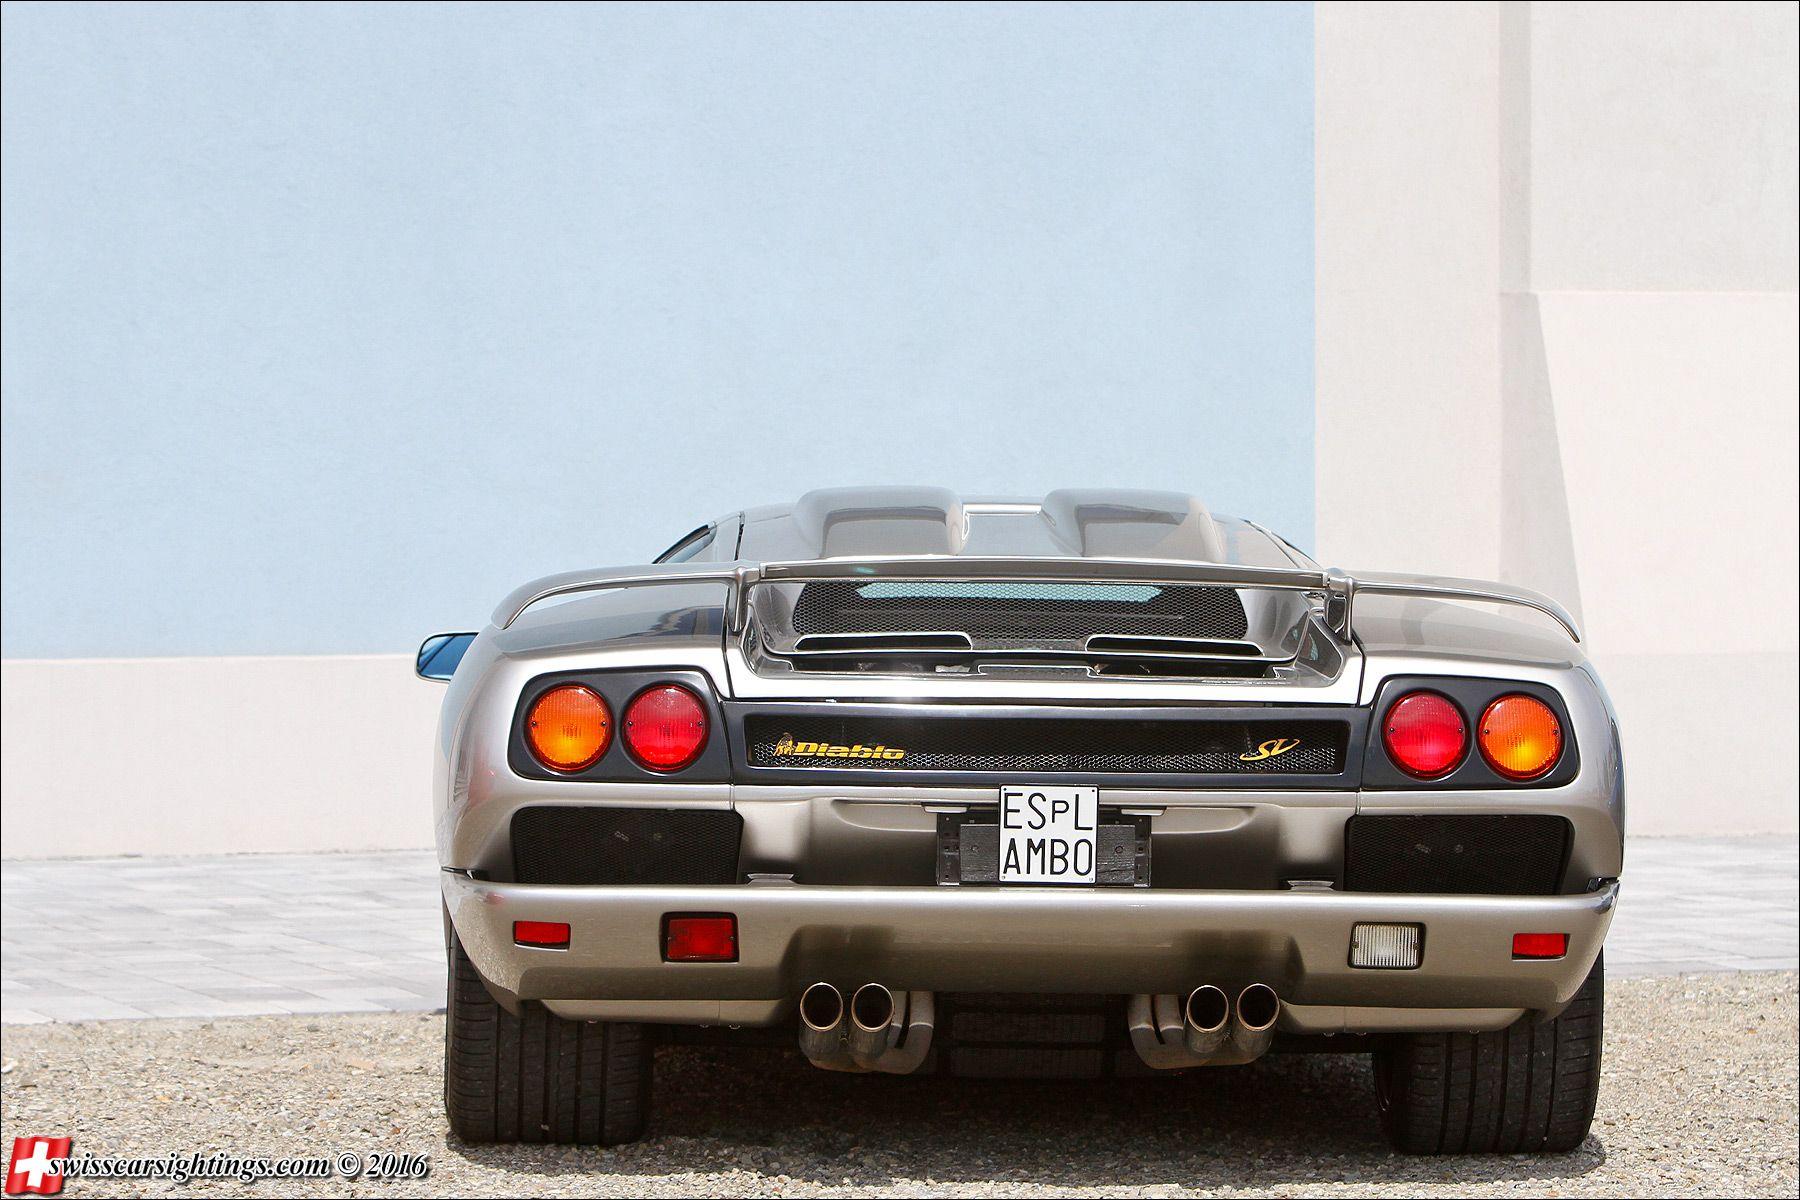 7fbd891e4d351902da5cbae6a64da132 Breathtaking Price Of Lamborghini Huracán Lp 610 4 Cars Trend